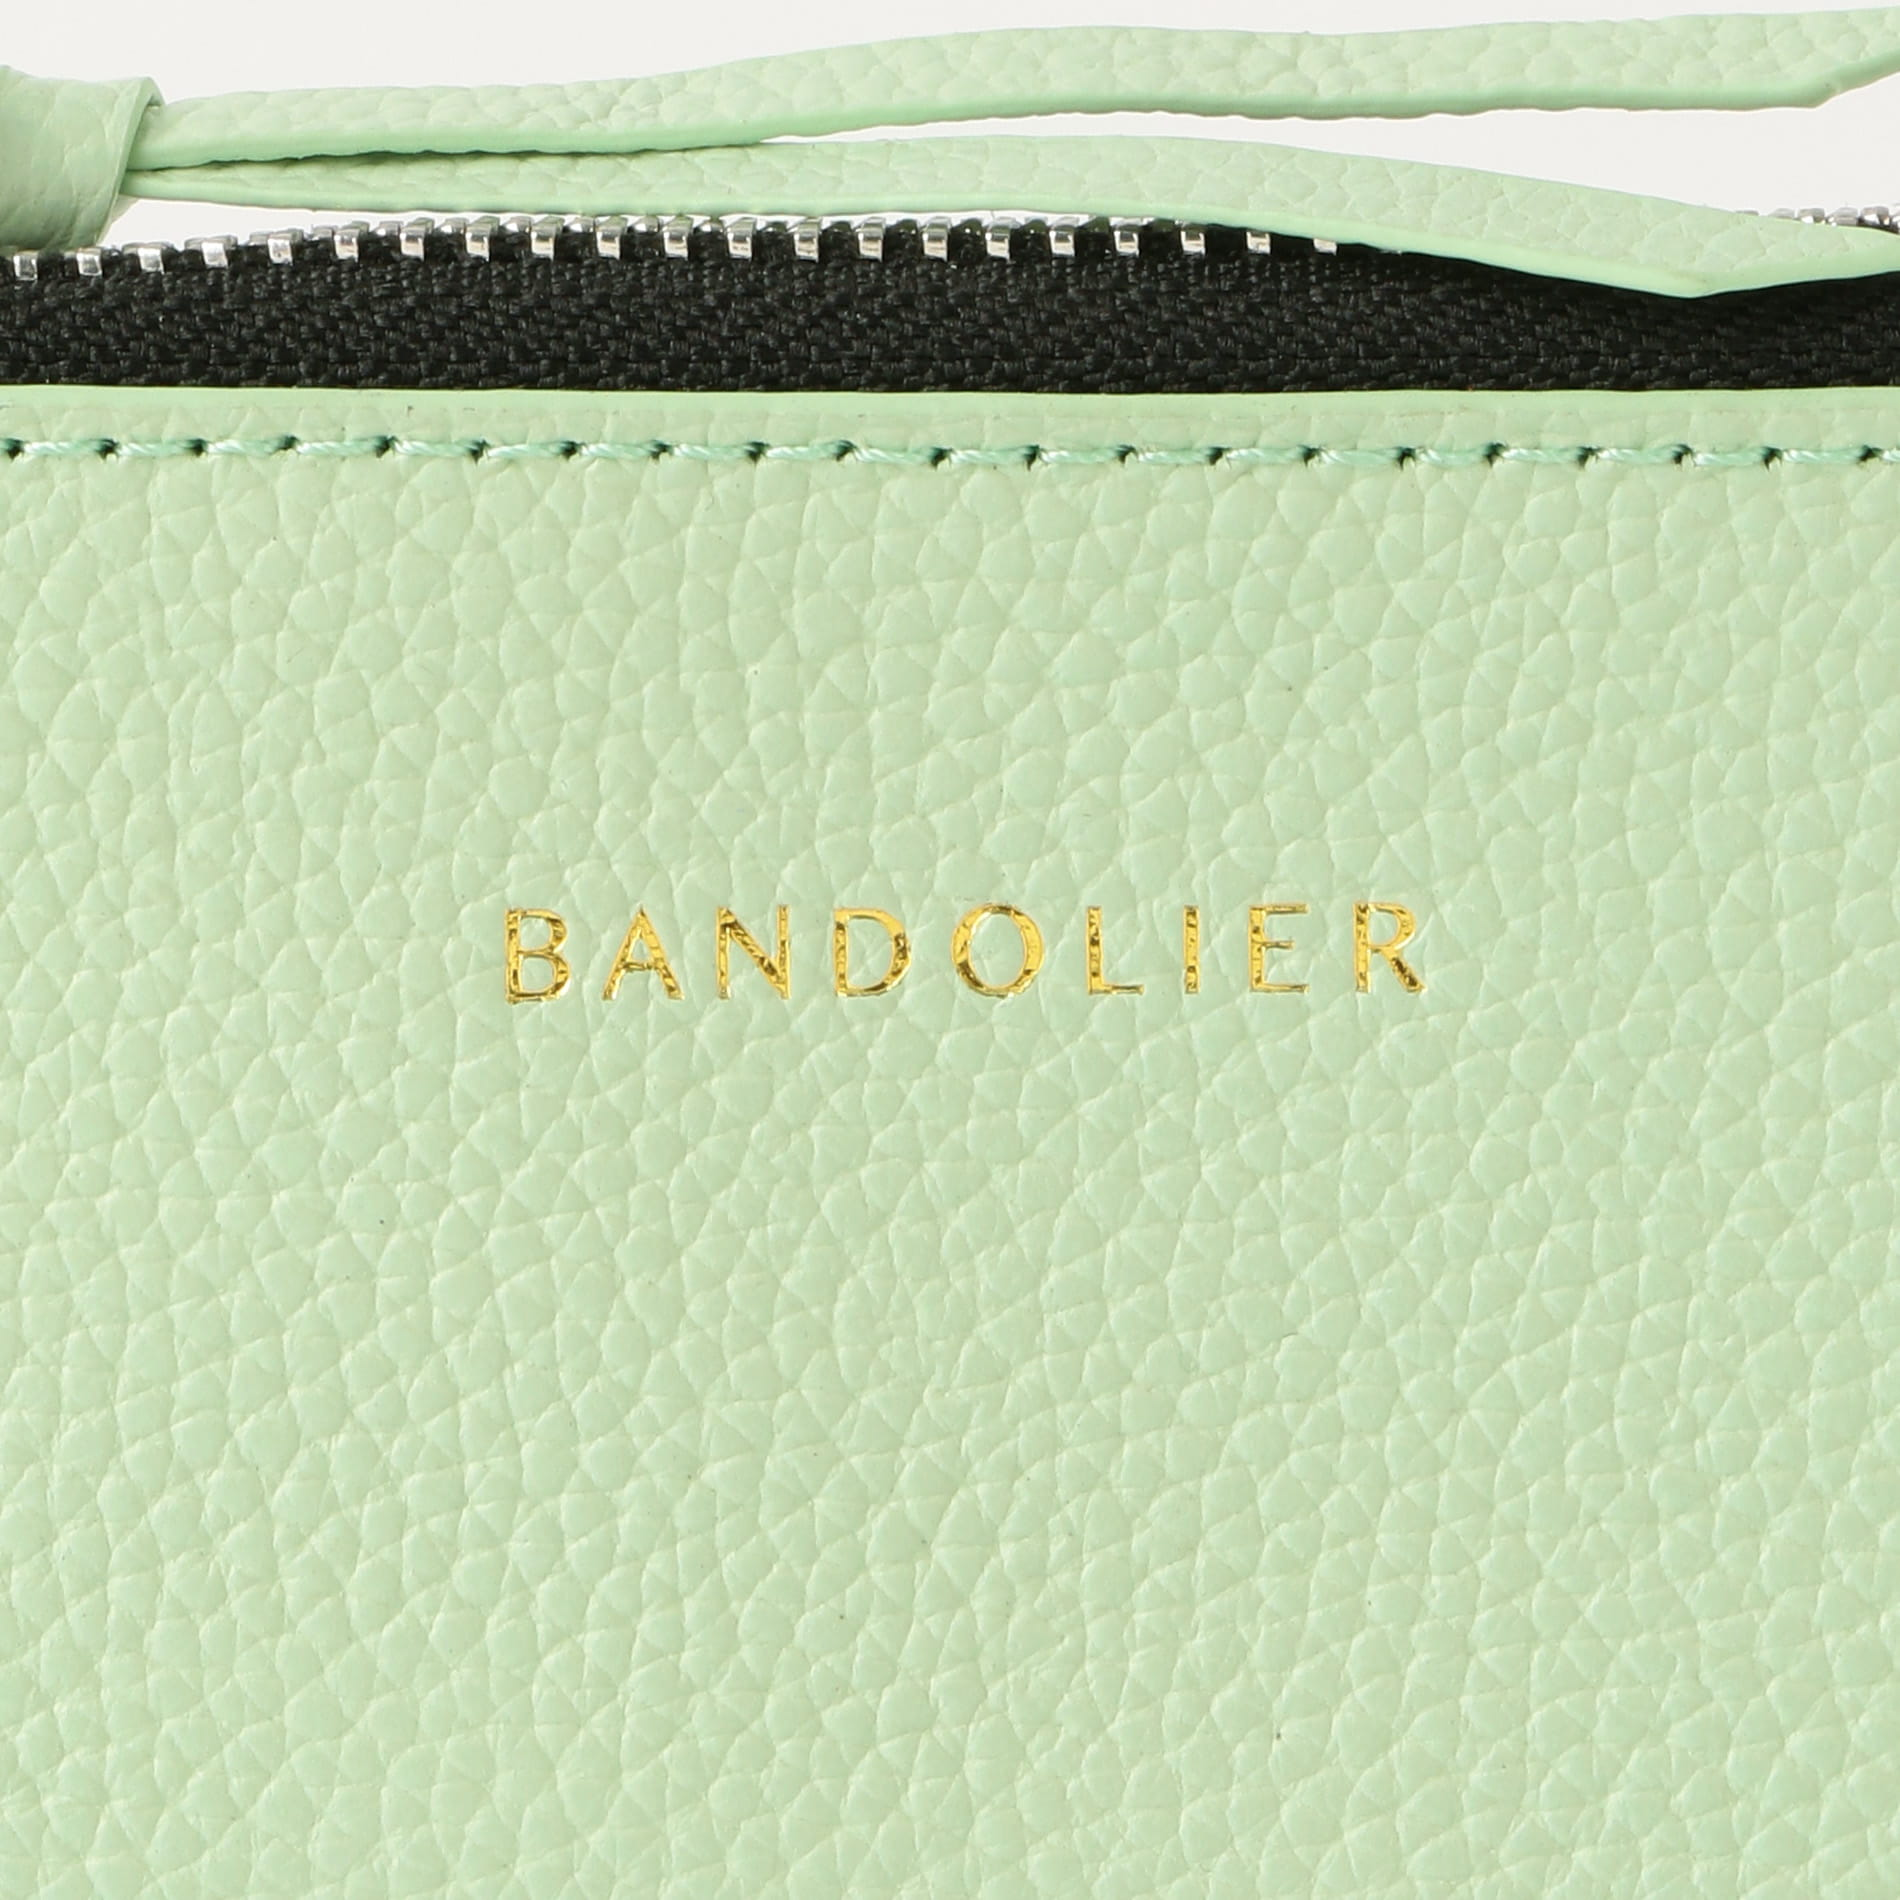 【BANDOLIER】NICOLE MIST GREEN POUCH bdl05-20nic-migrn